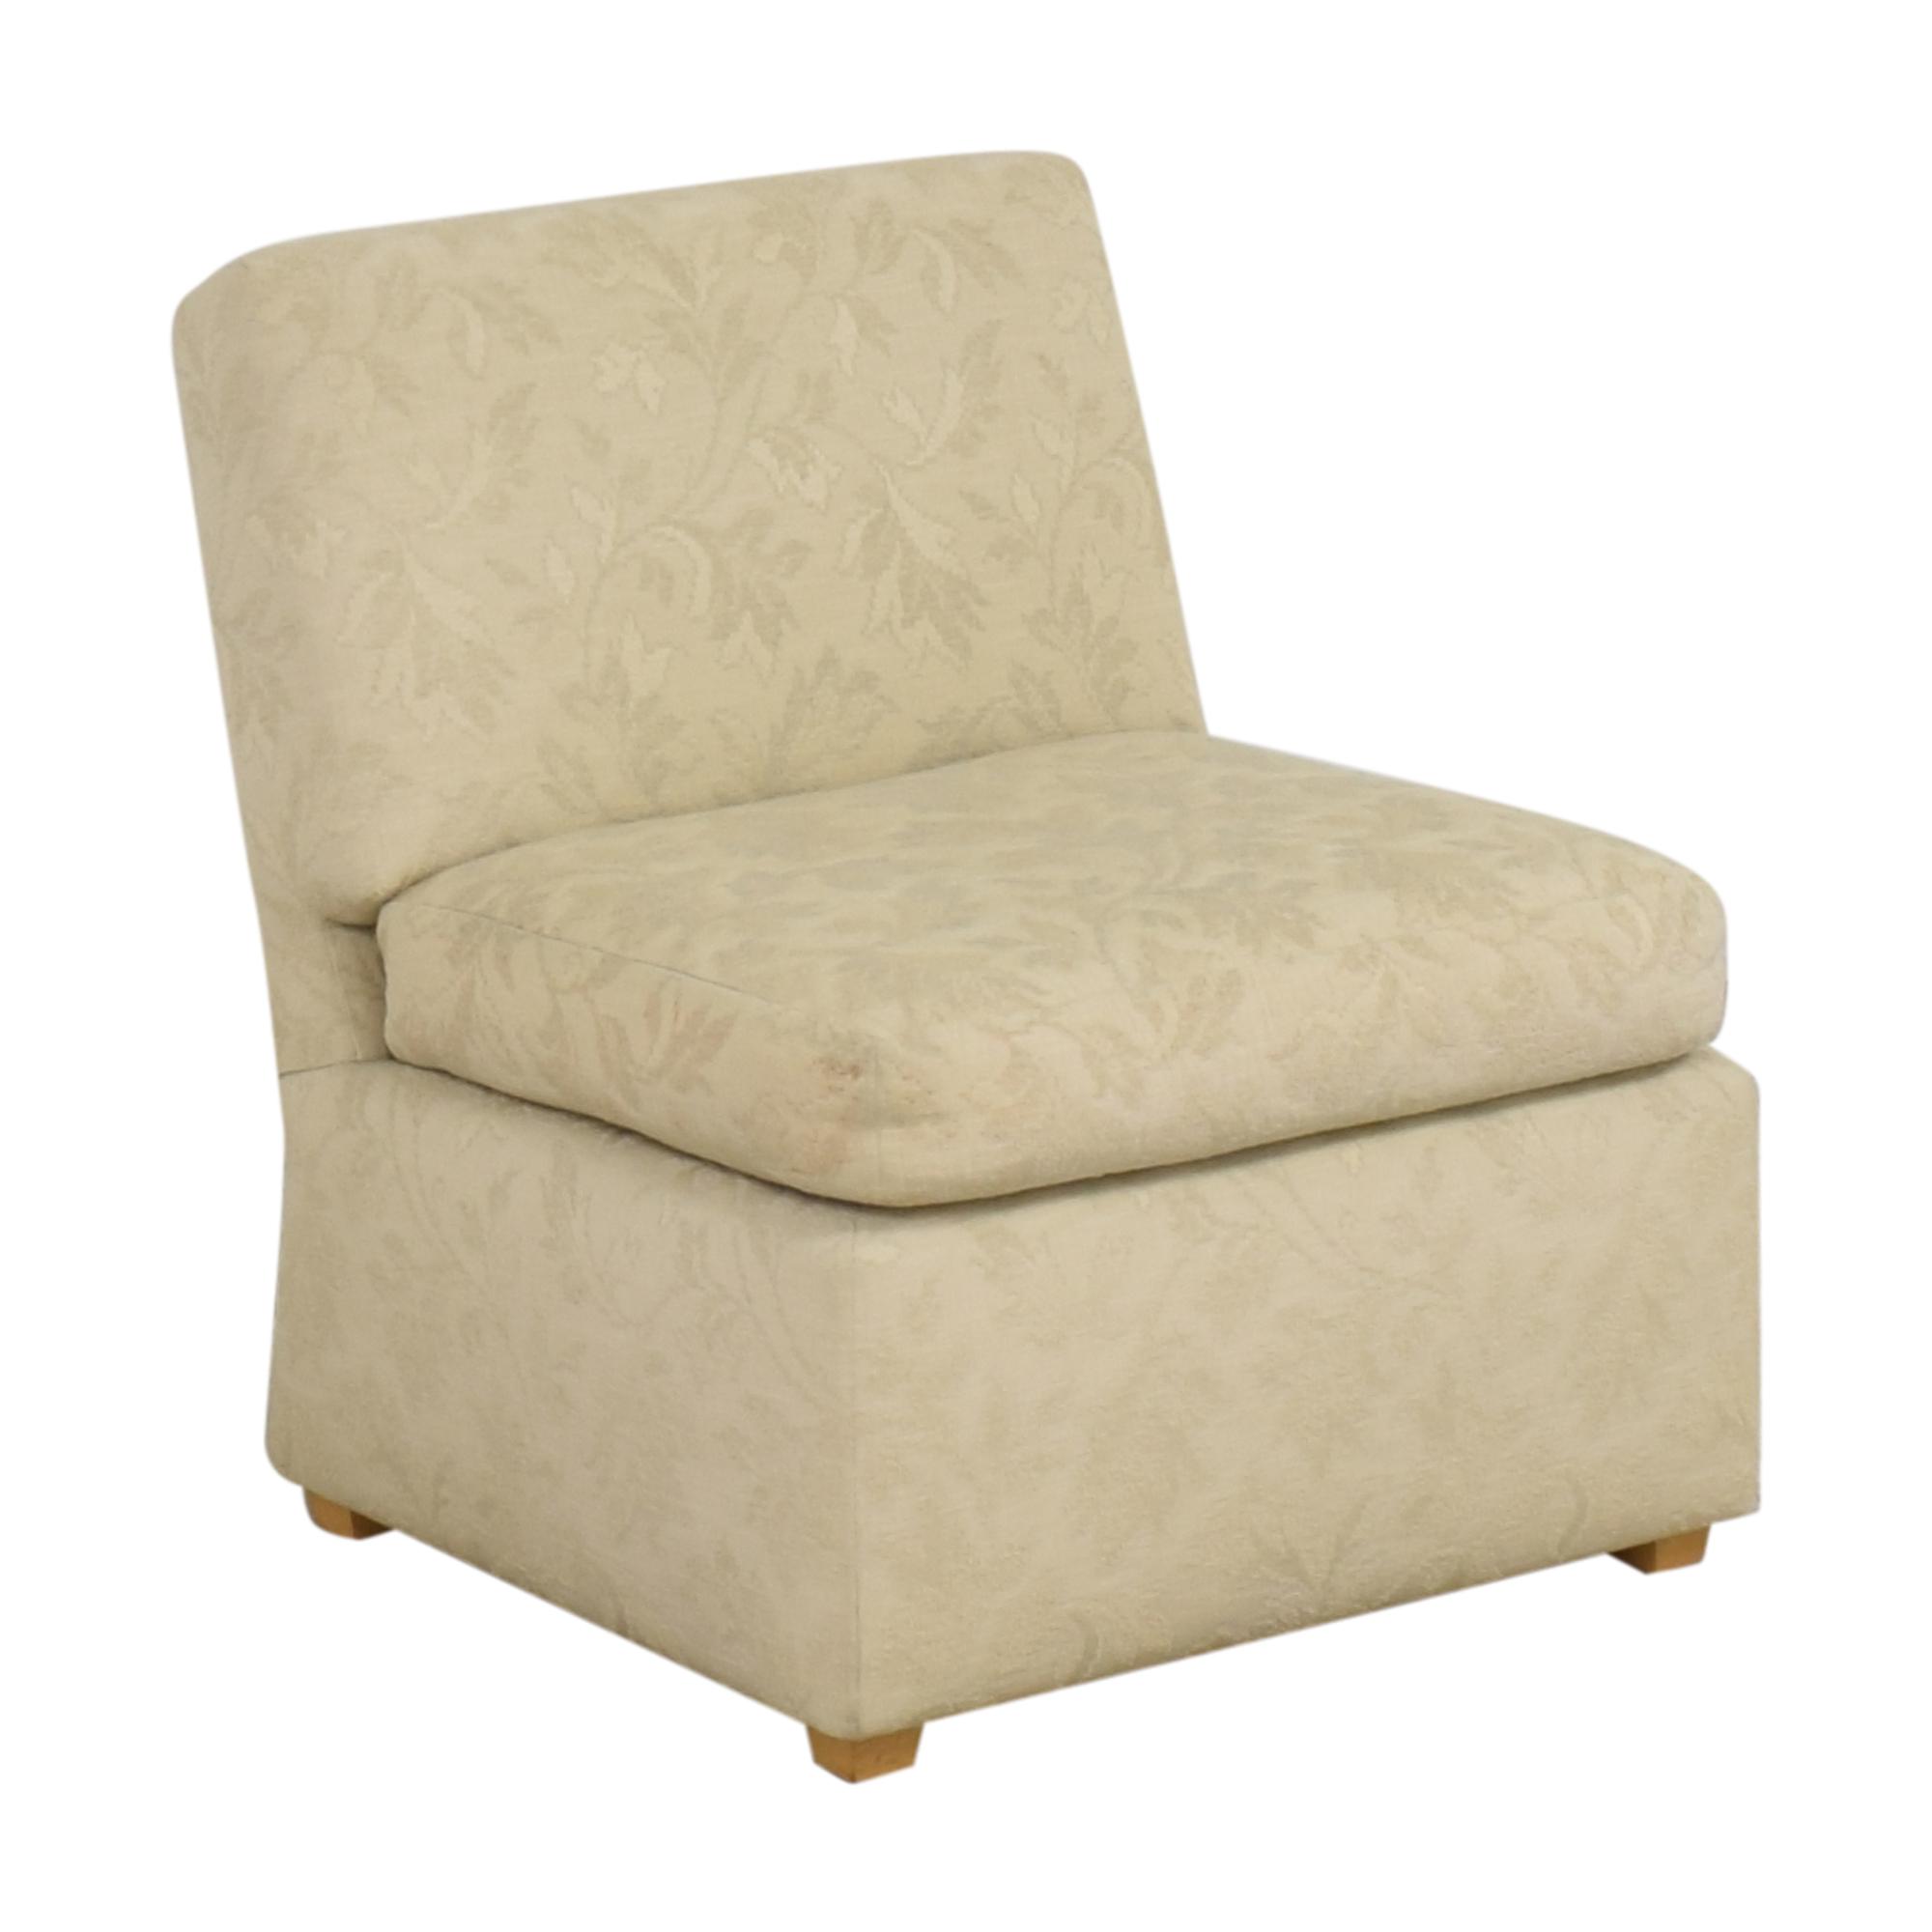 Billy Baldwin Studio Billy Baldwin Studio Large Slipper Chair by Ventry pa